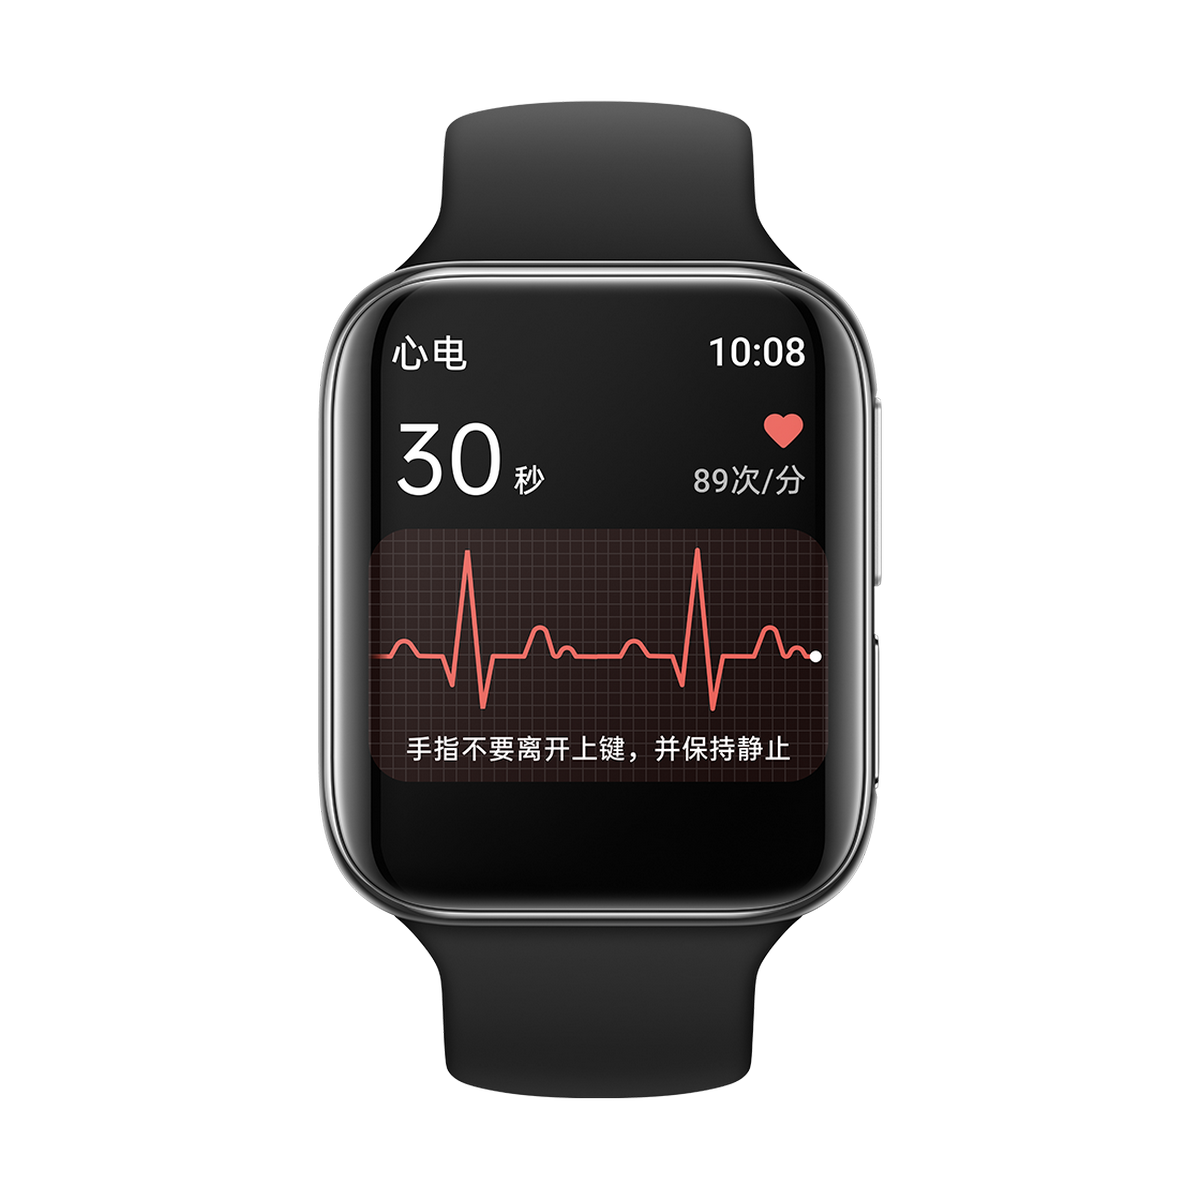 Представлены умные часы Oppo Watch ECG Edition